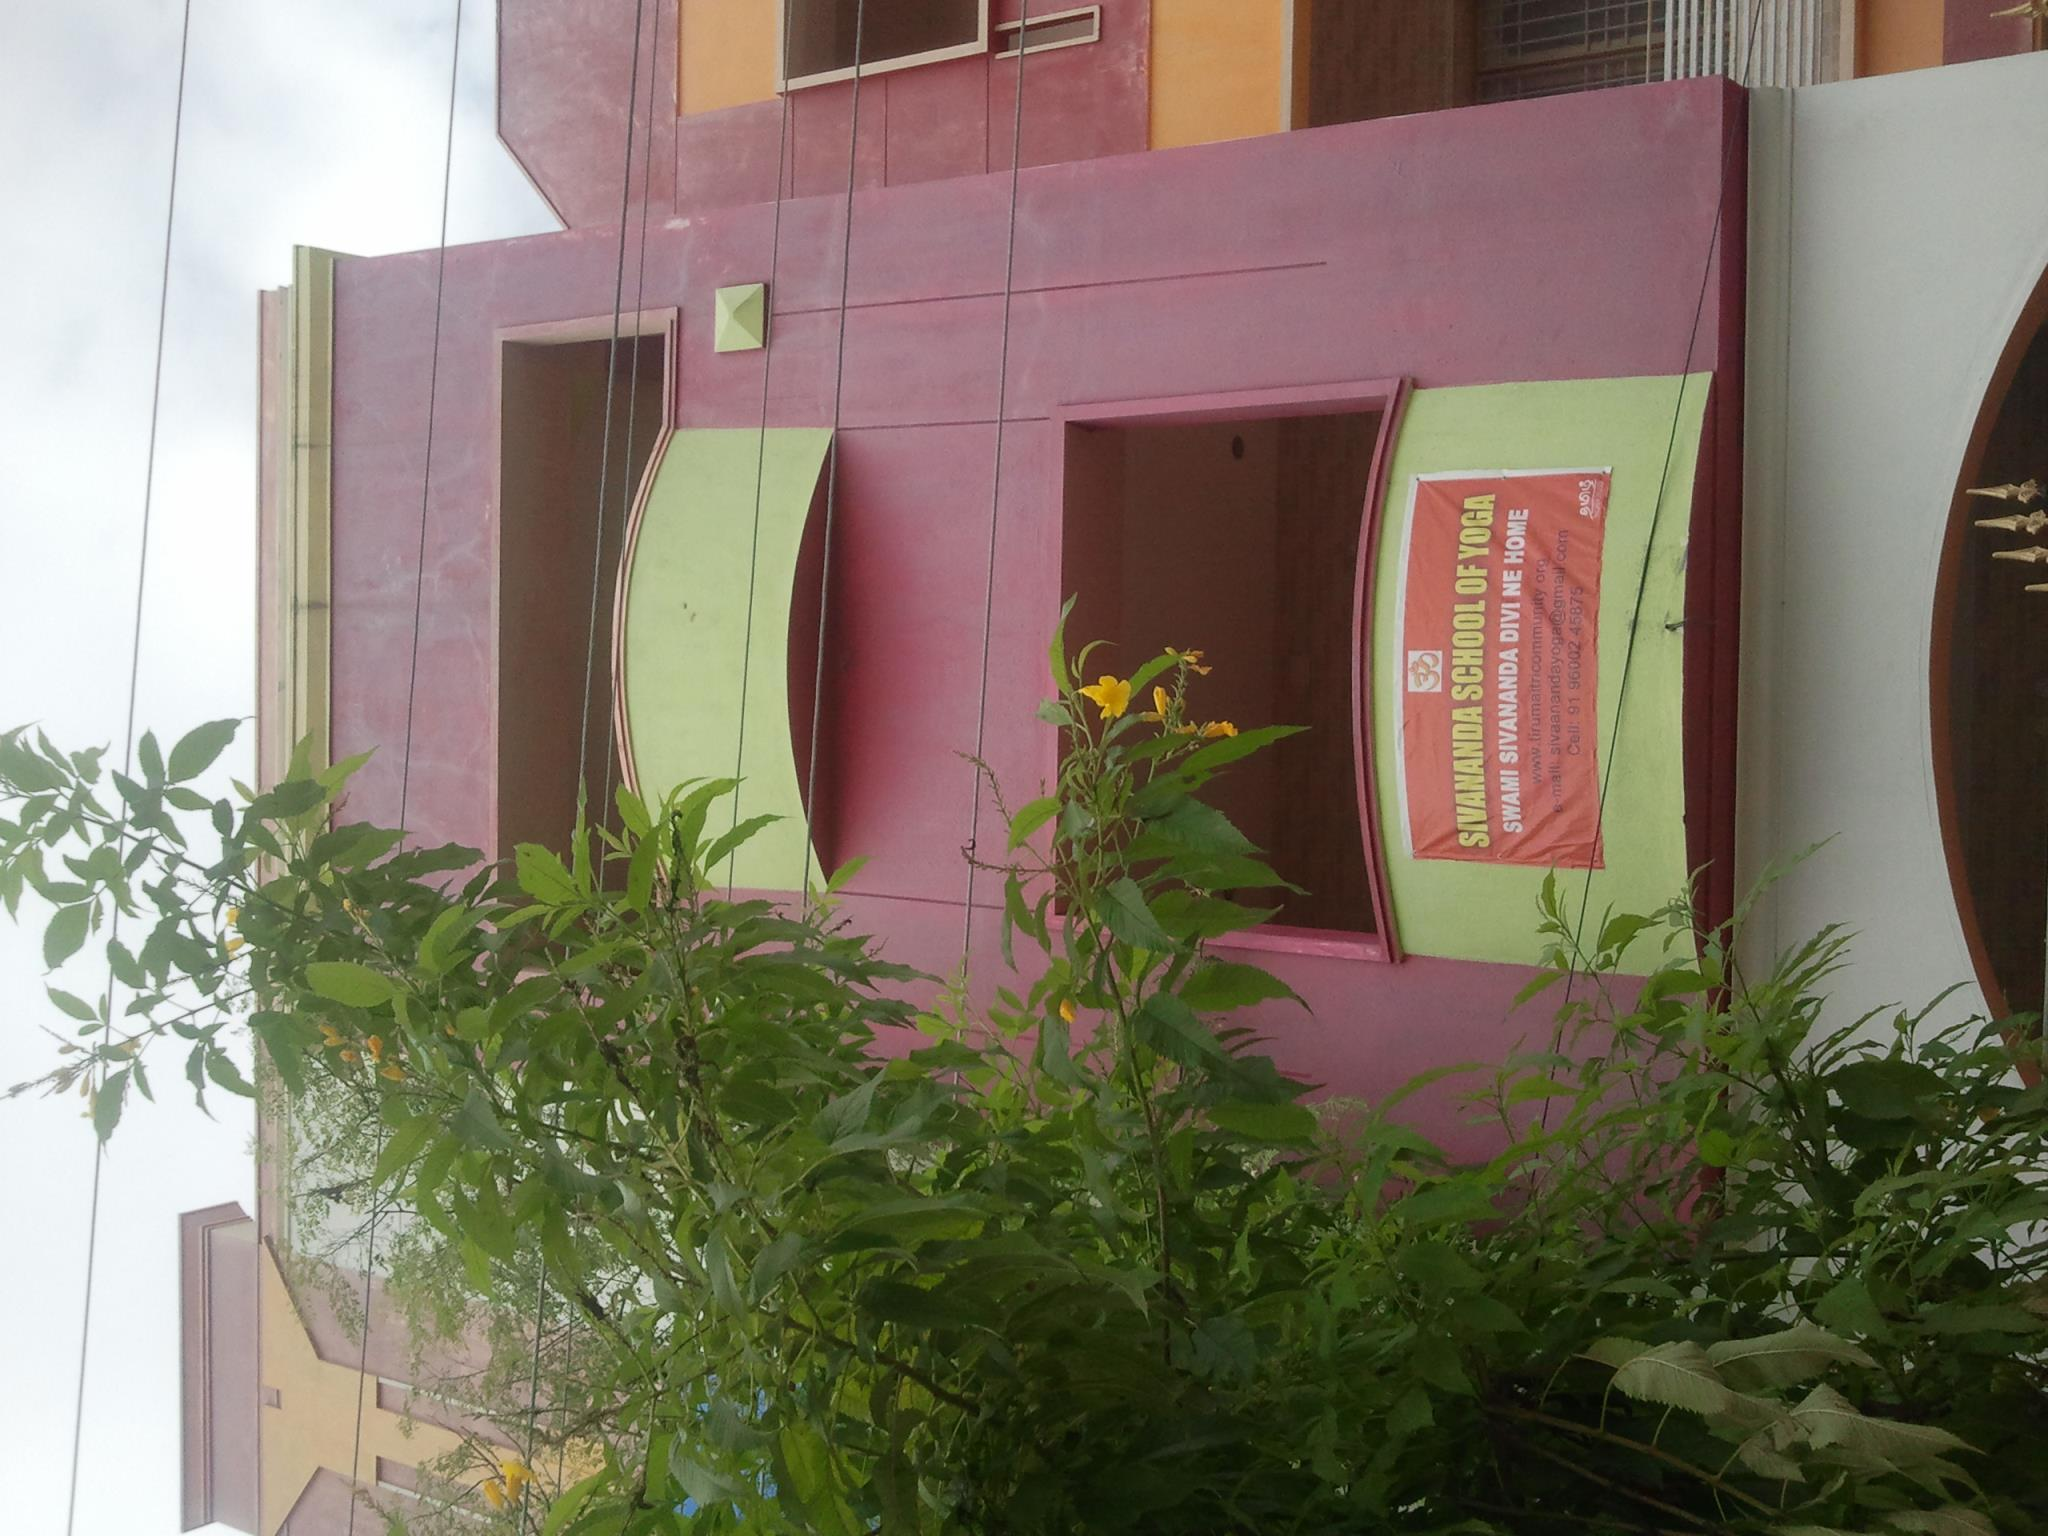 Swami Sivananda Divine Home, Tiruvannamalai